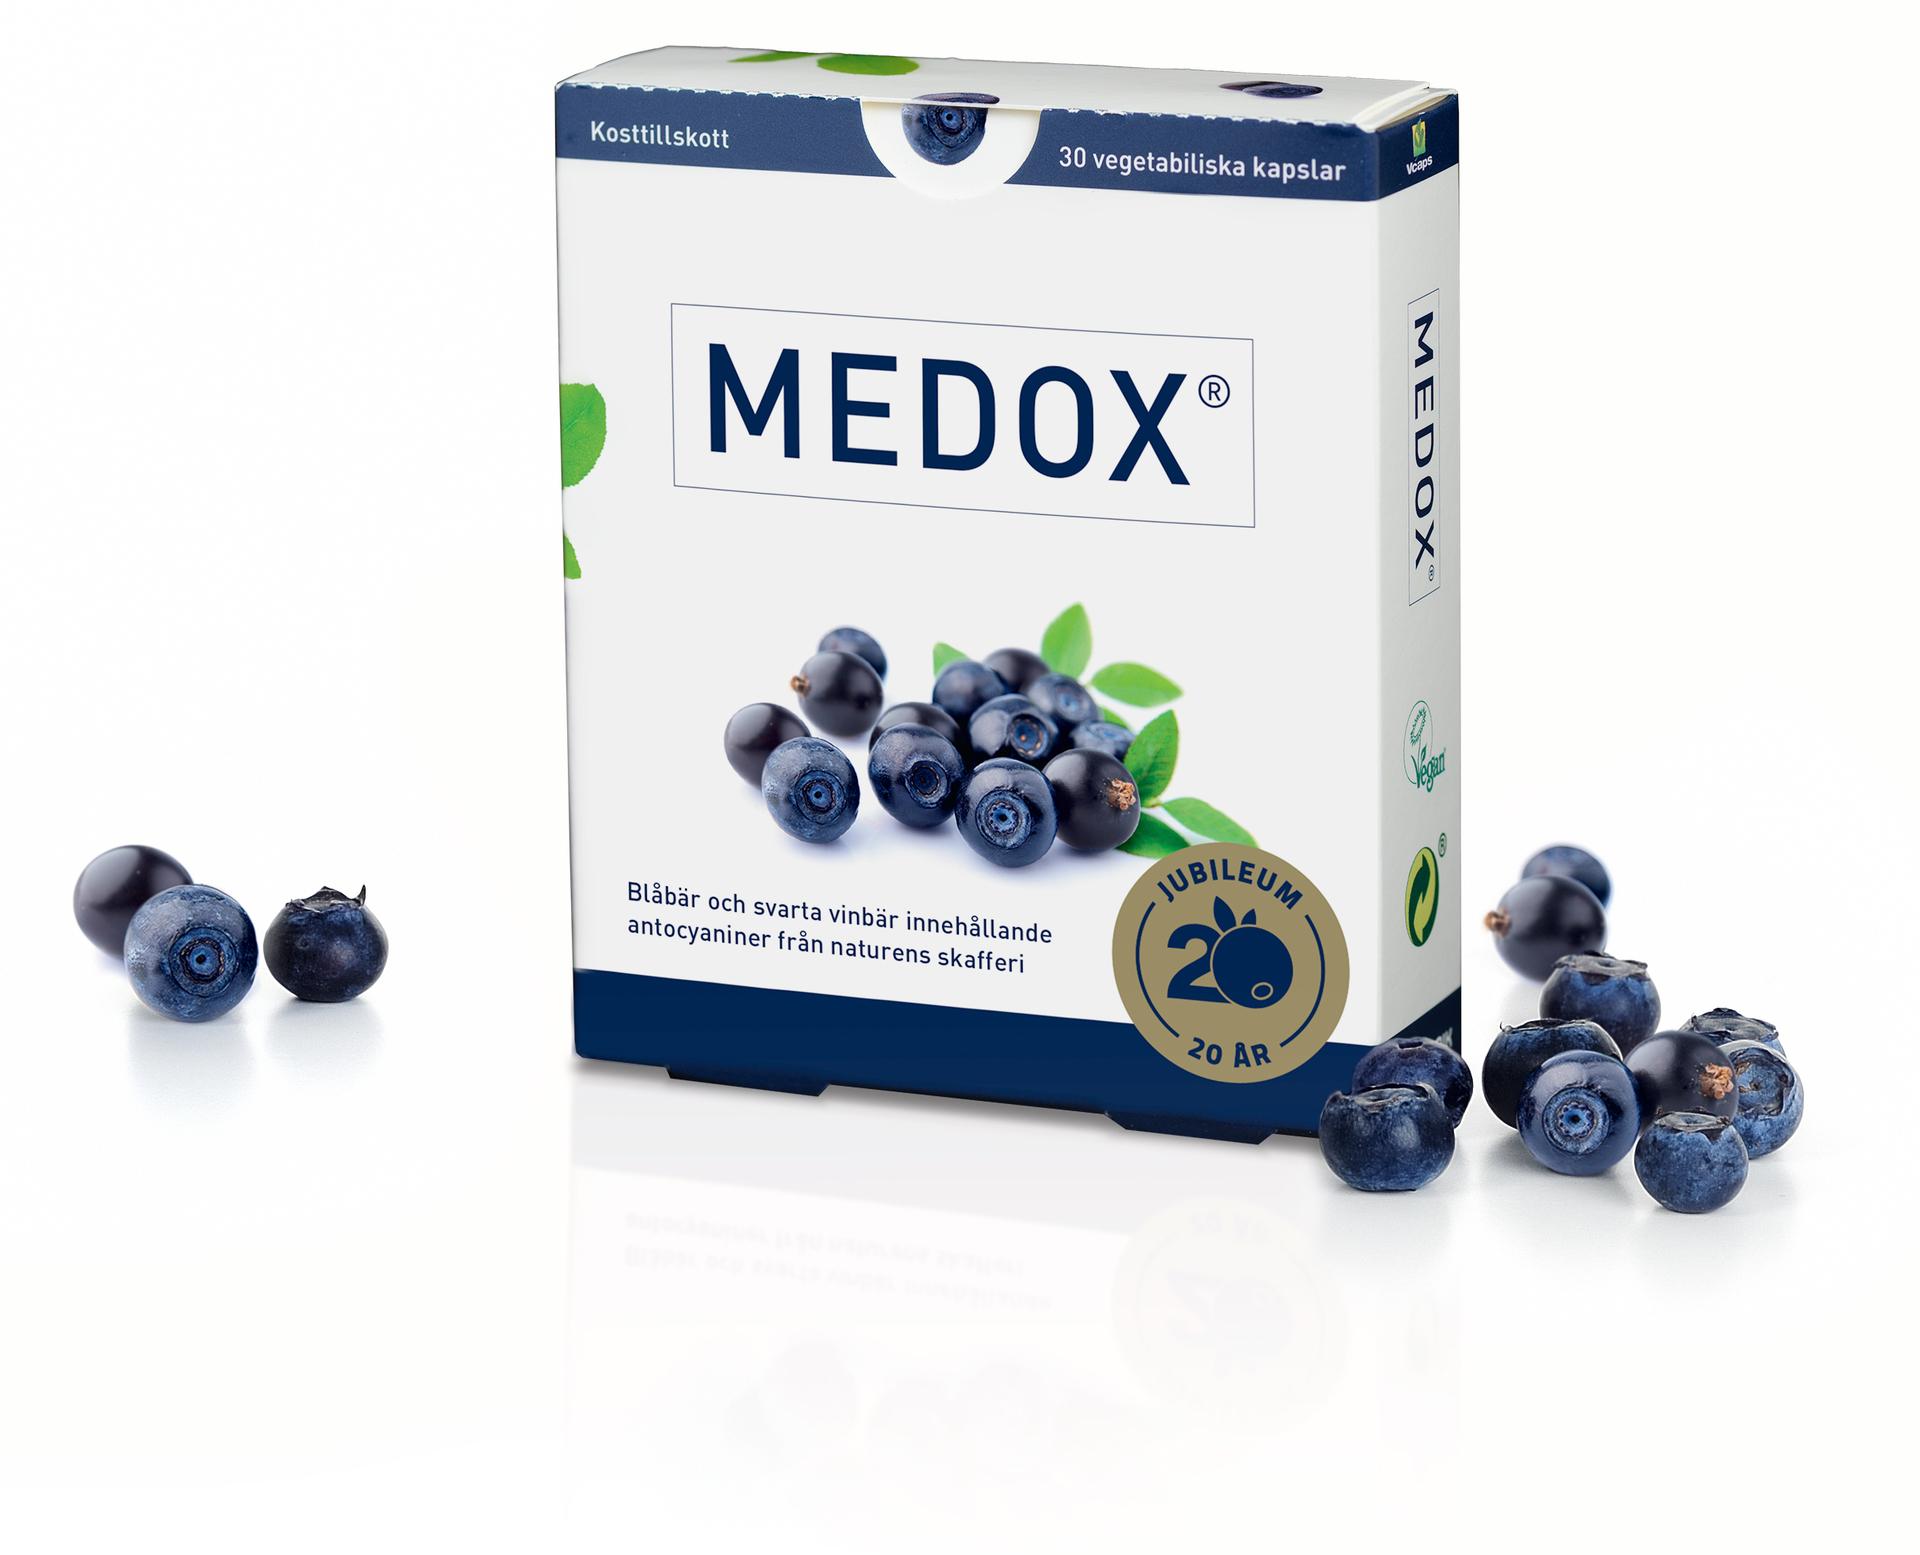 Medox box